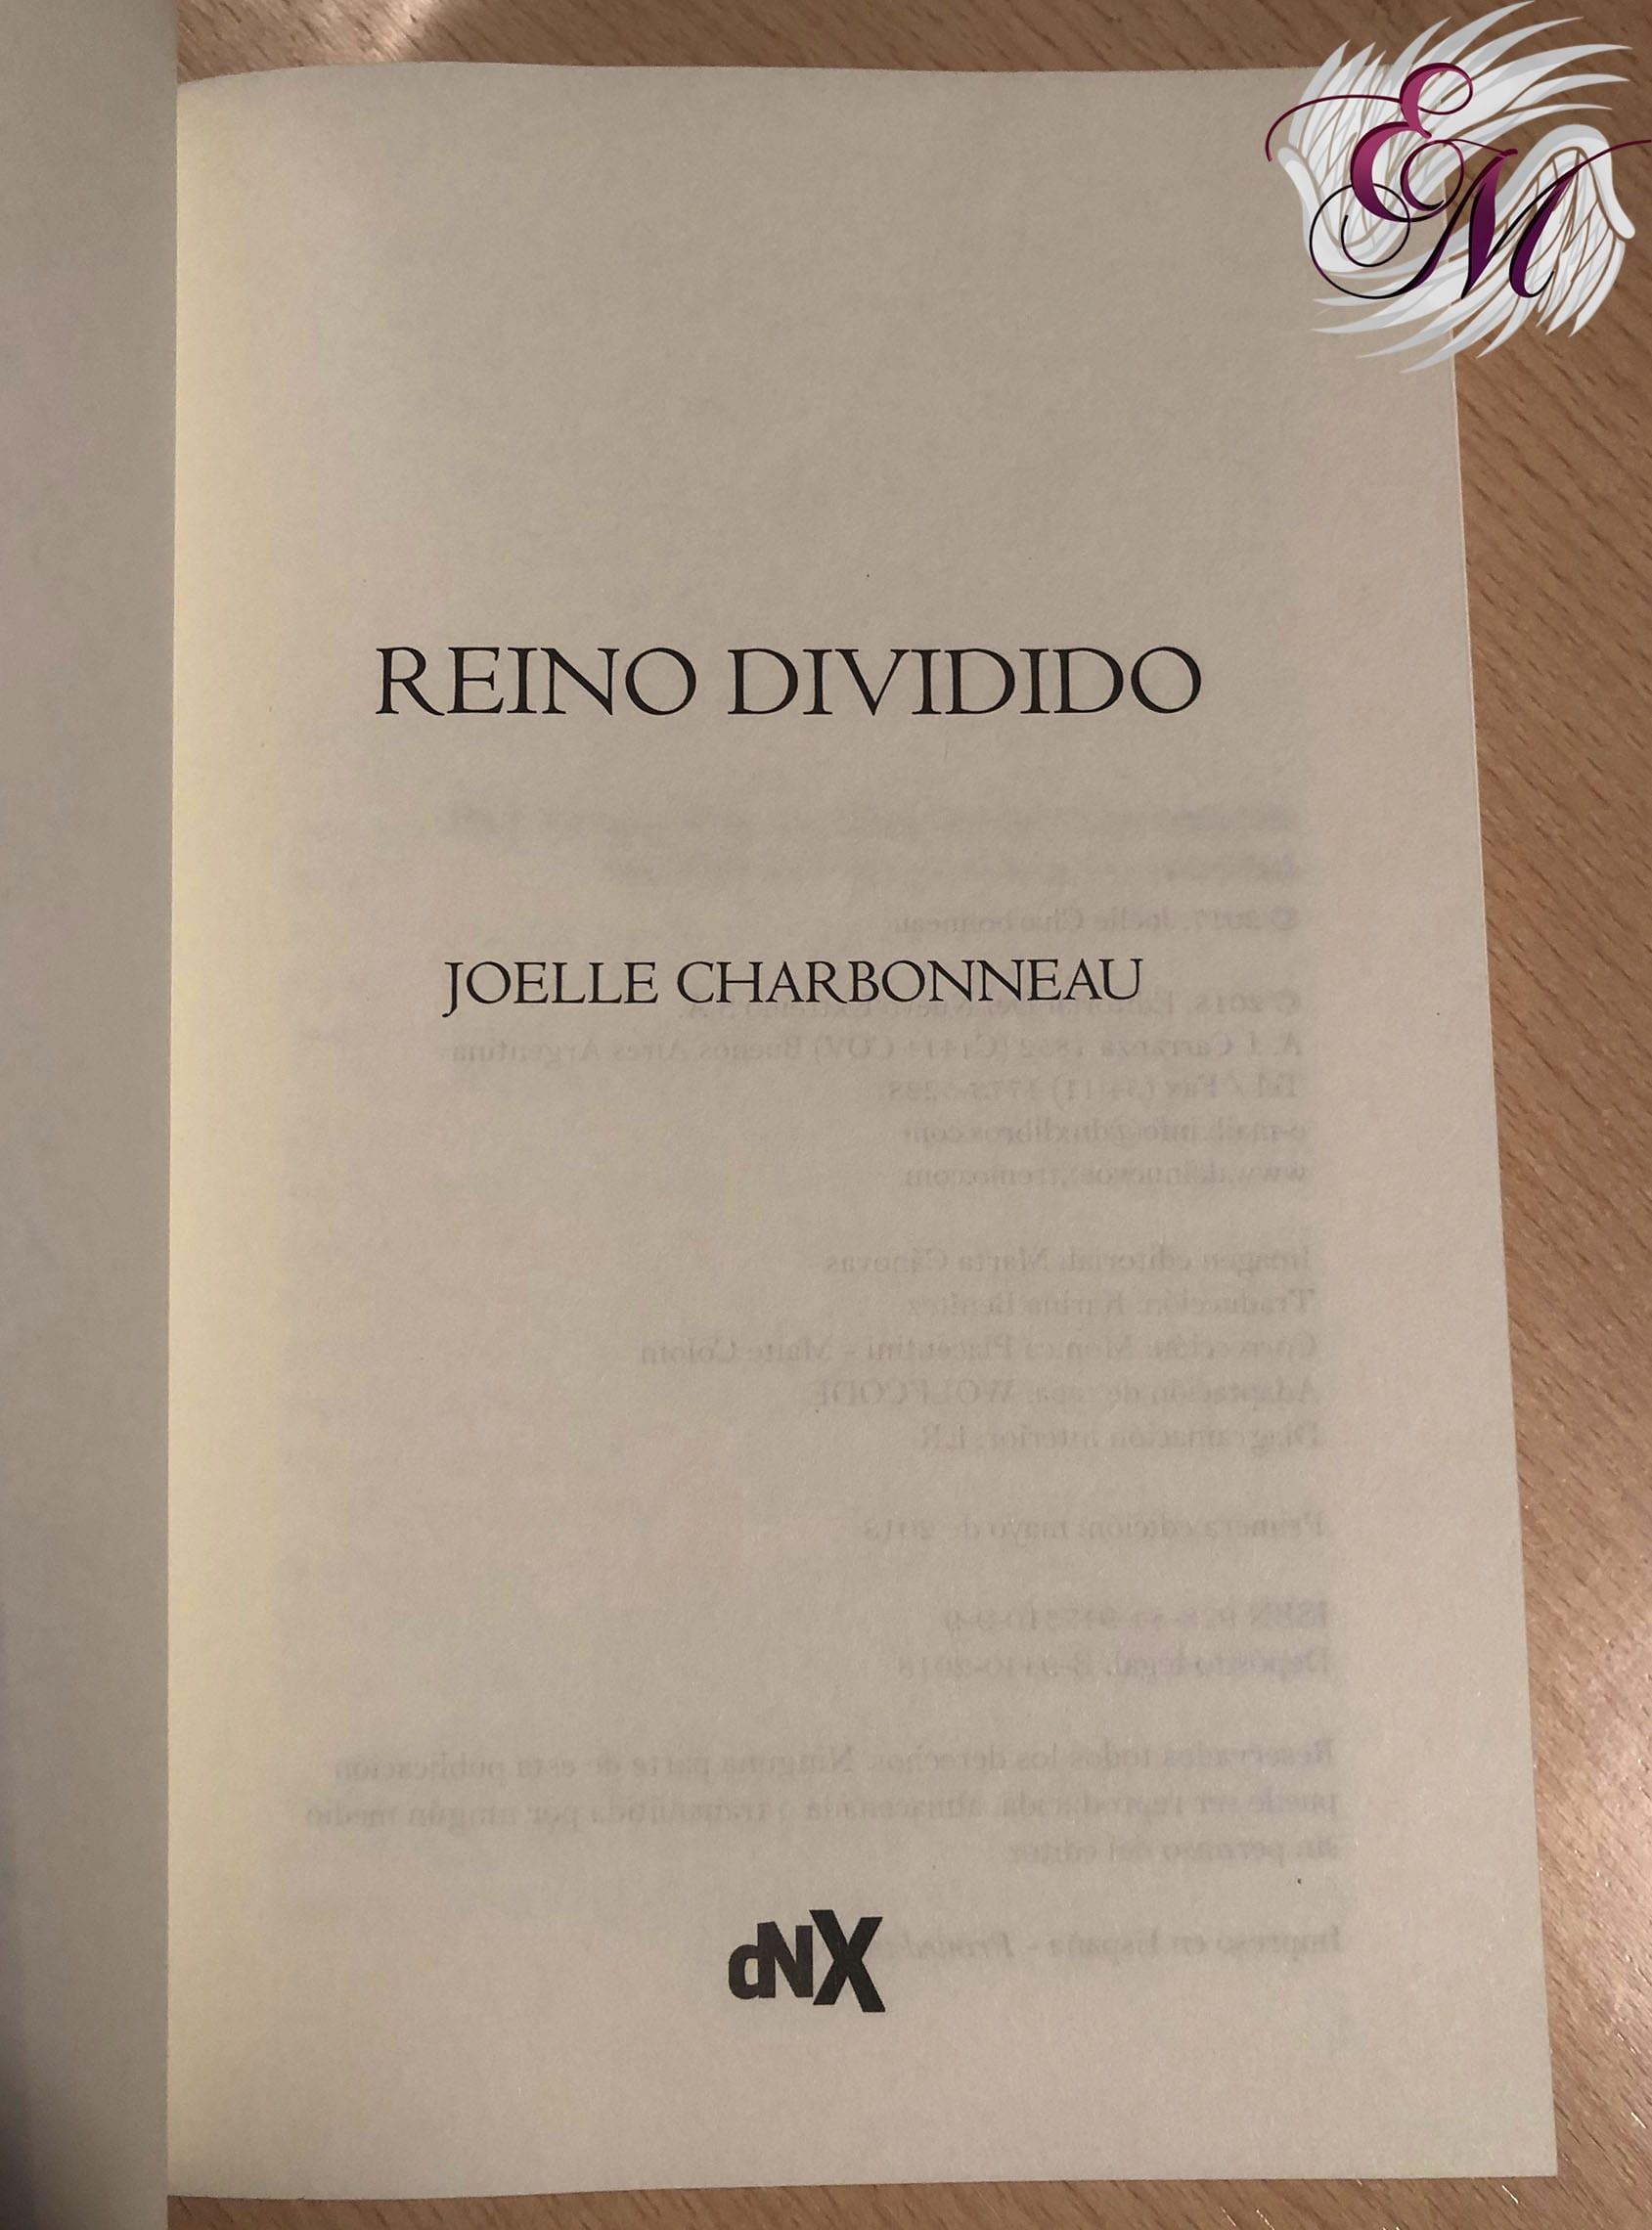 Reino dividido, de Joelle Charbonneau - Reseña